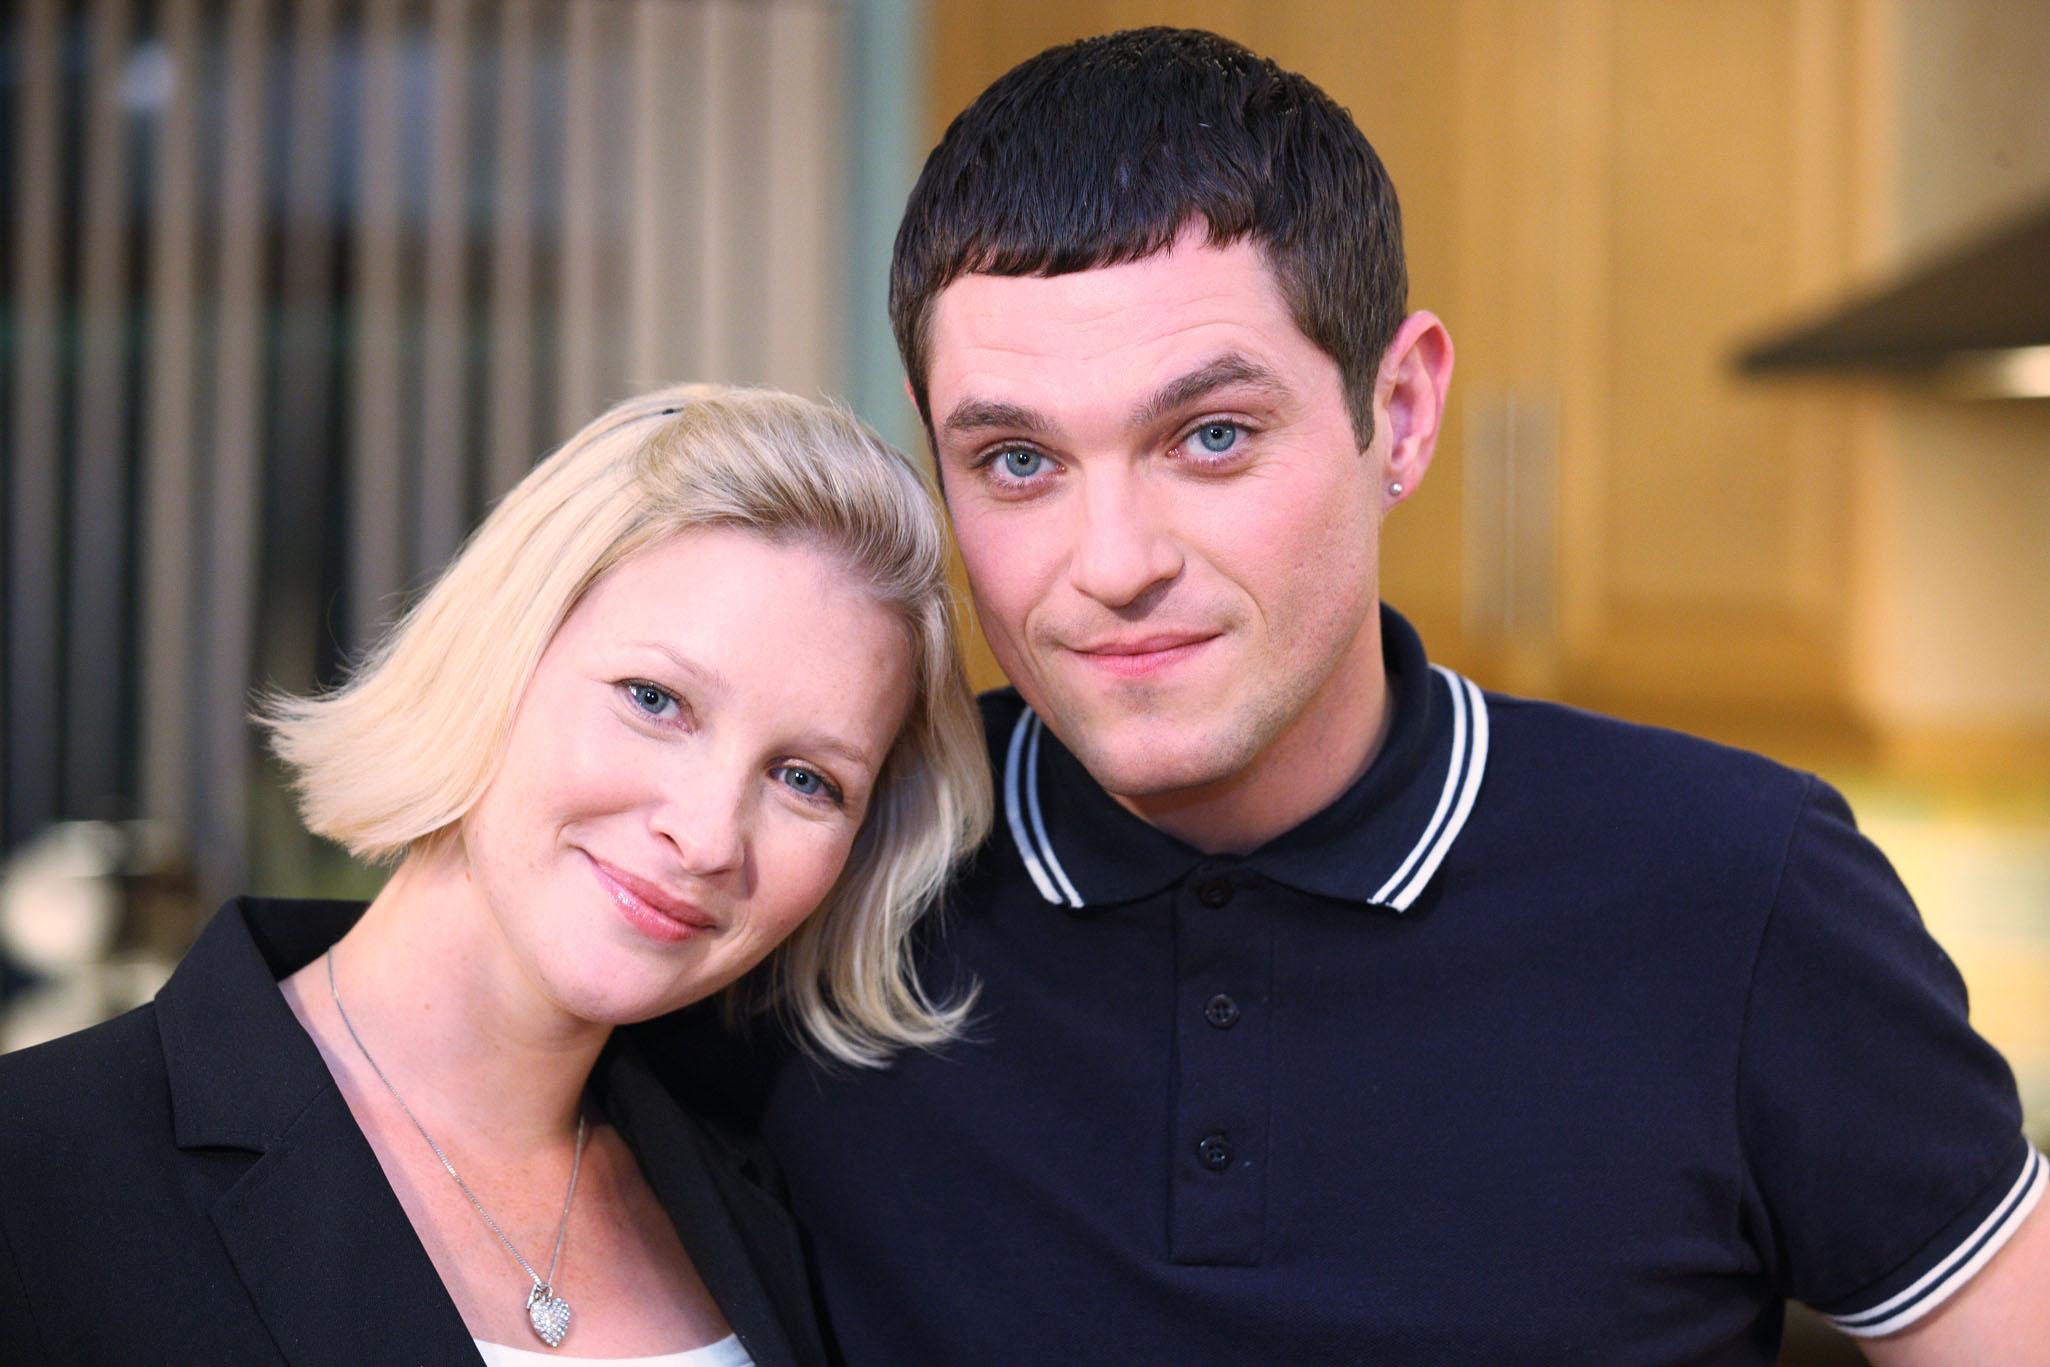 Mat Horne Gavin And Stacey Has Fairytale Ending News